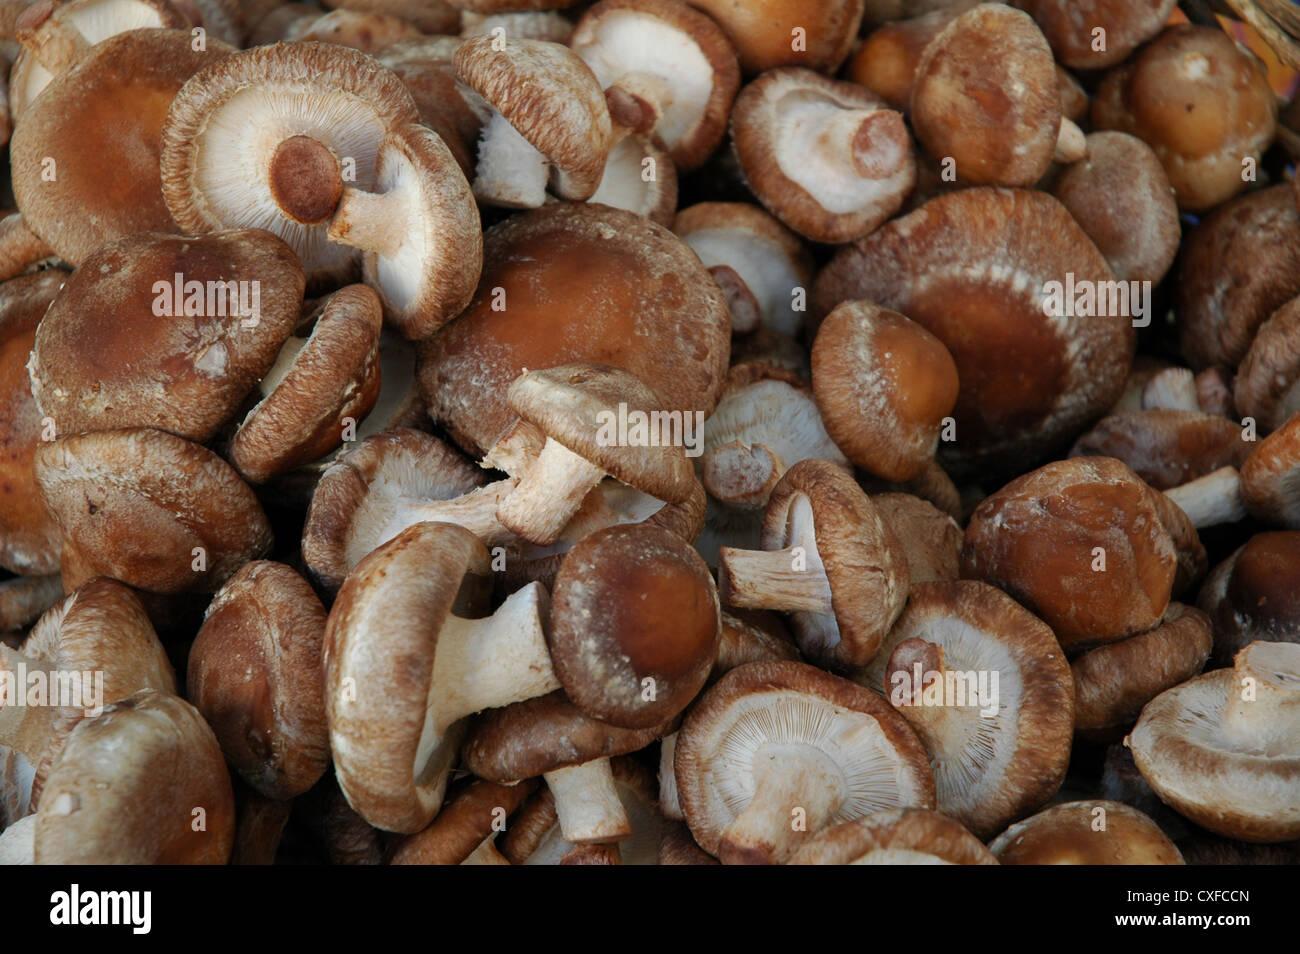 MushroomsStock Photo